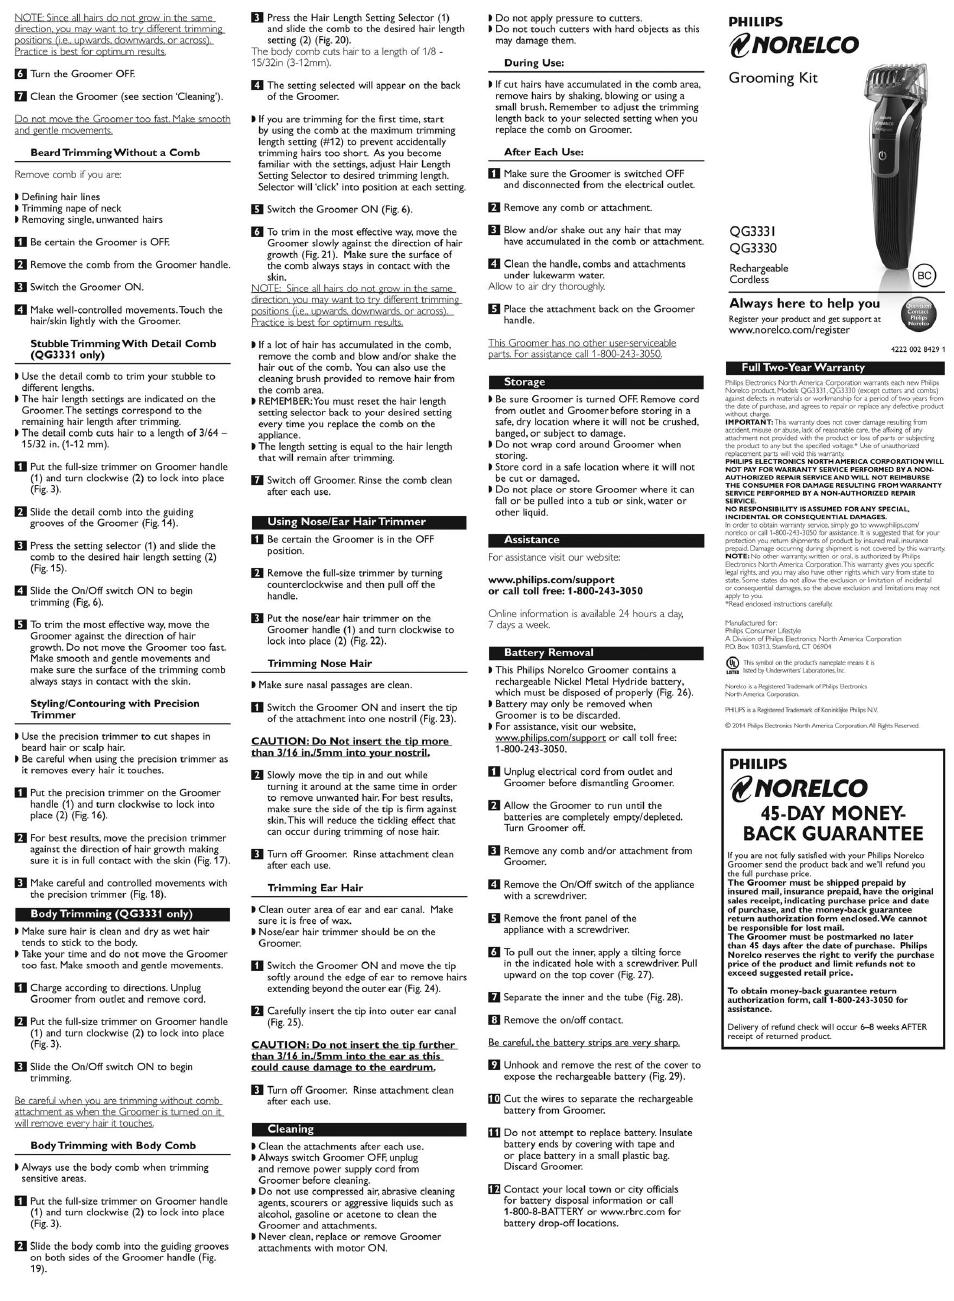 norelco grooming kit qg333i philips norelco multigroom 3300 rh manualsdir com Philips Flat TV Manual Philips Electronics Manuals